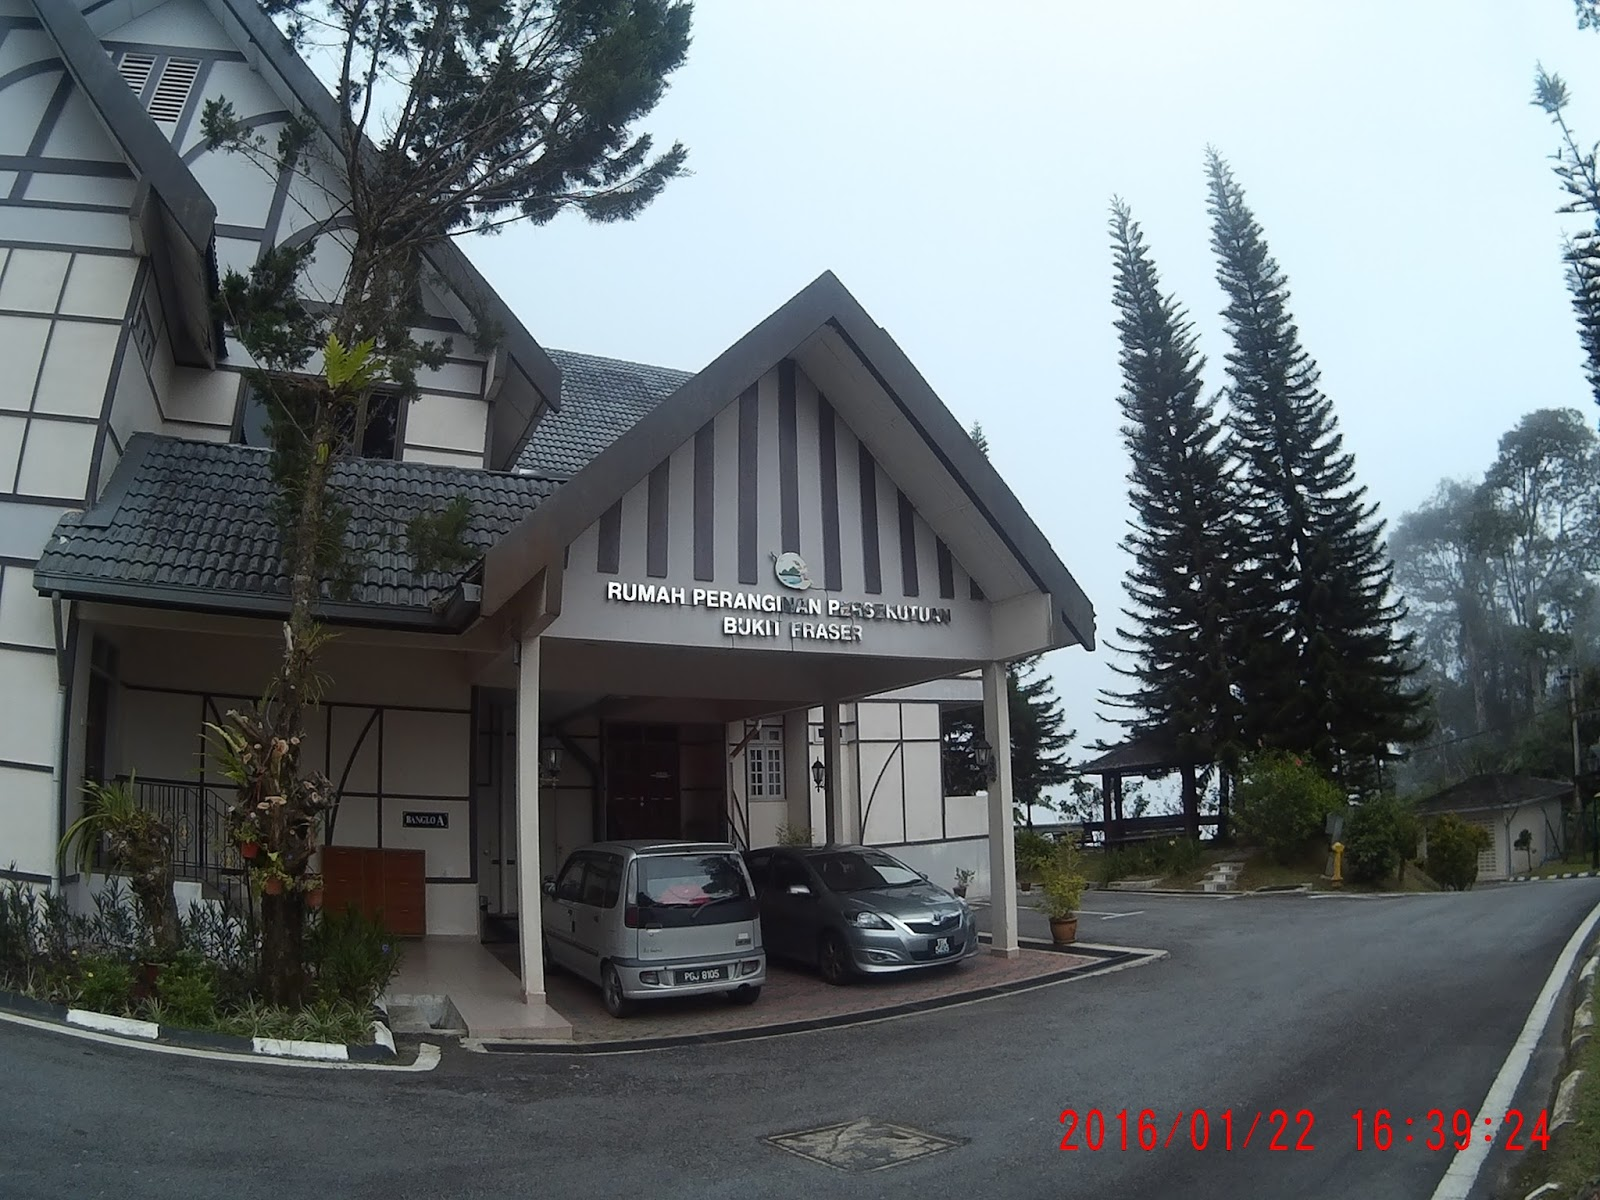 Rumah Peranginan Persekutuan Bukit Fraser Fraser S Hill Pahang Malaysia Nyepi M